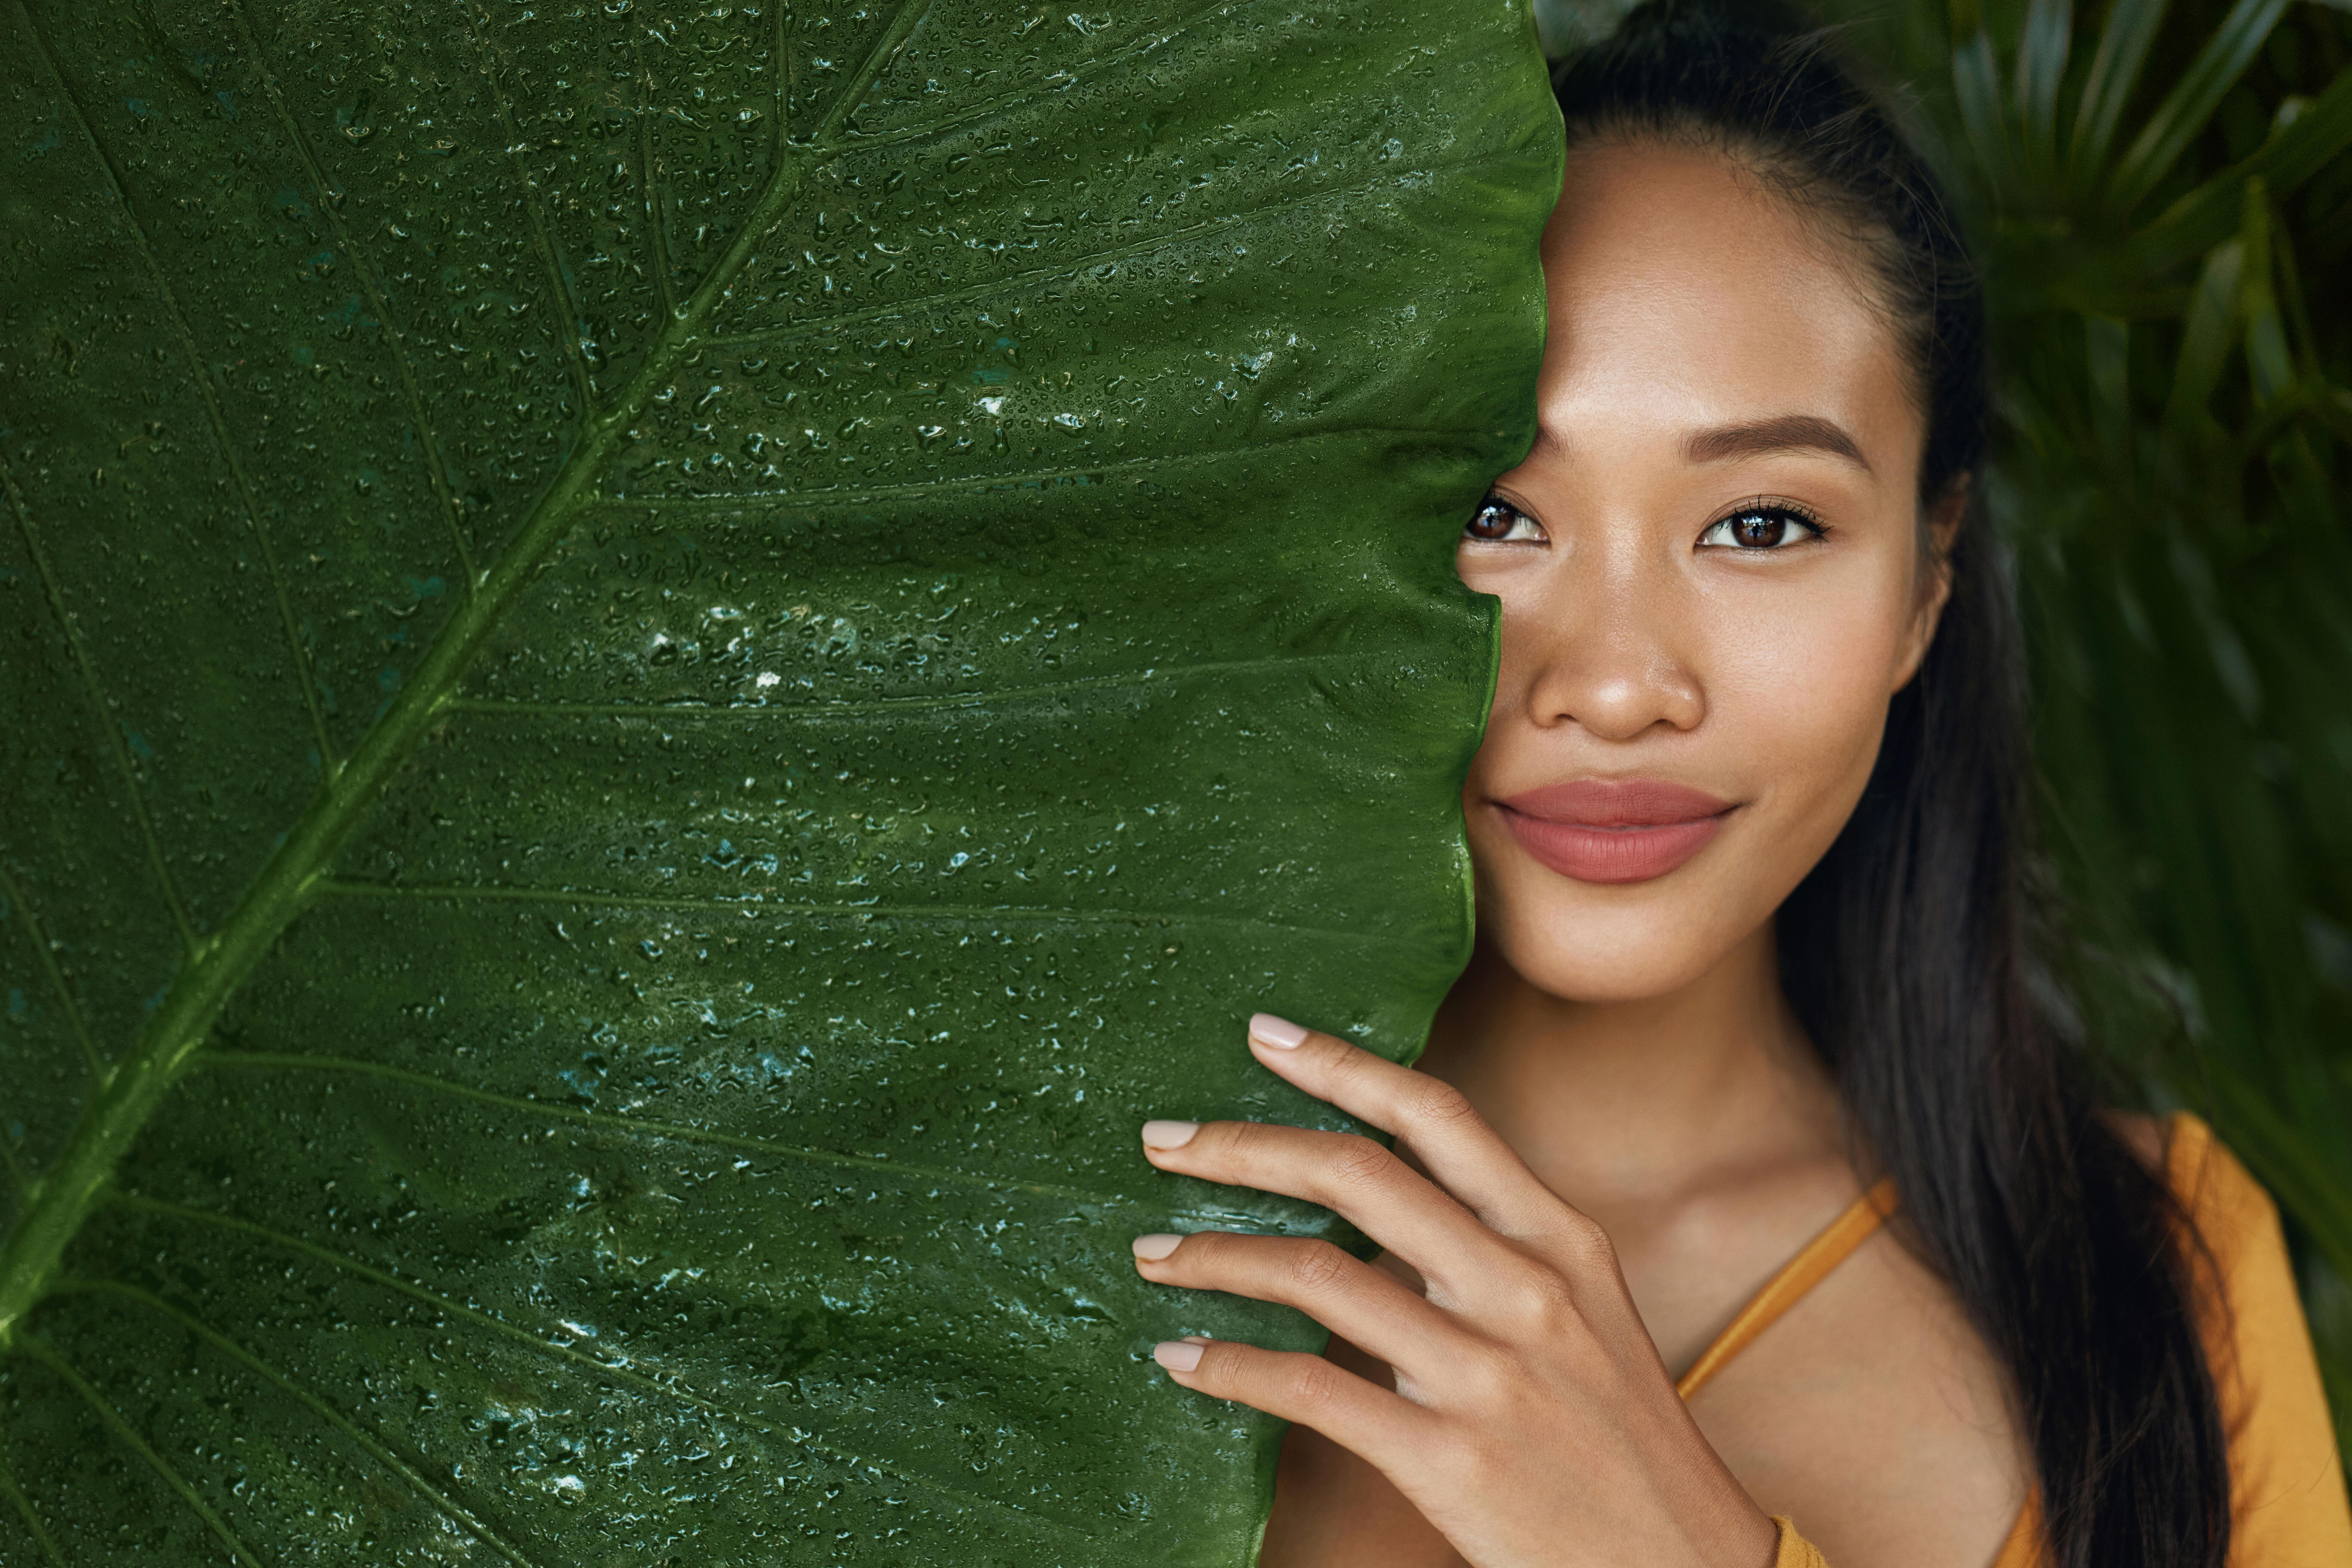 A girl next to a large fern leaf